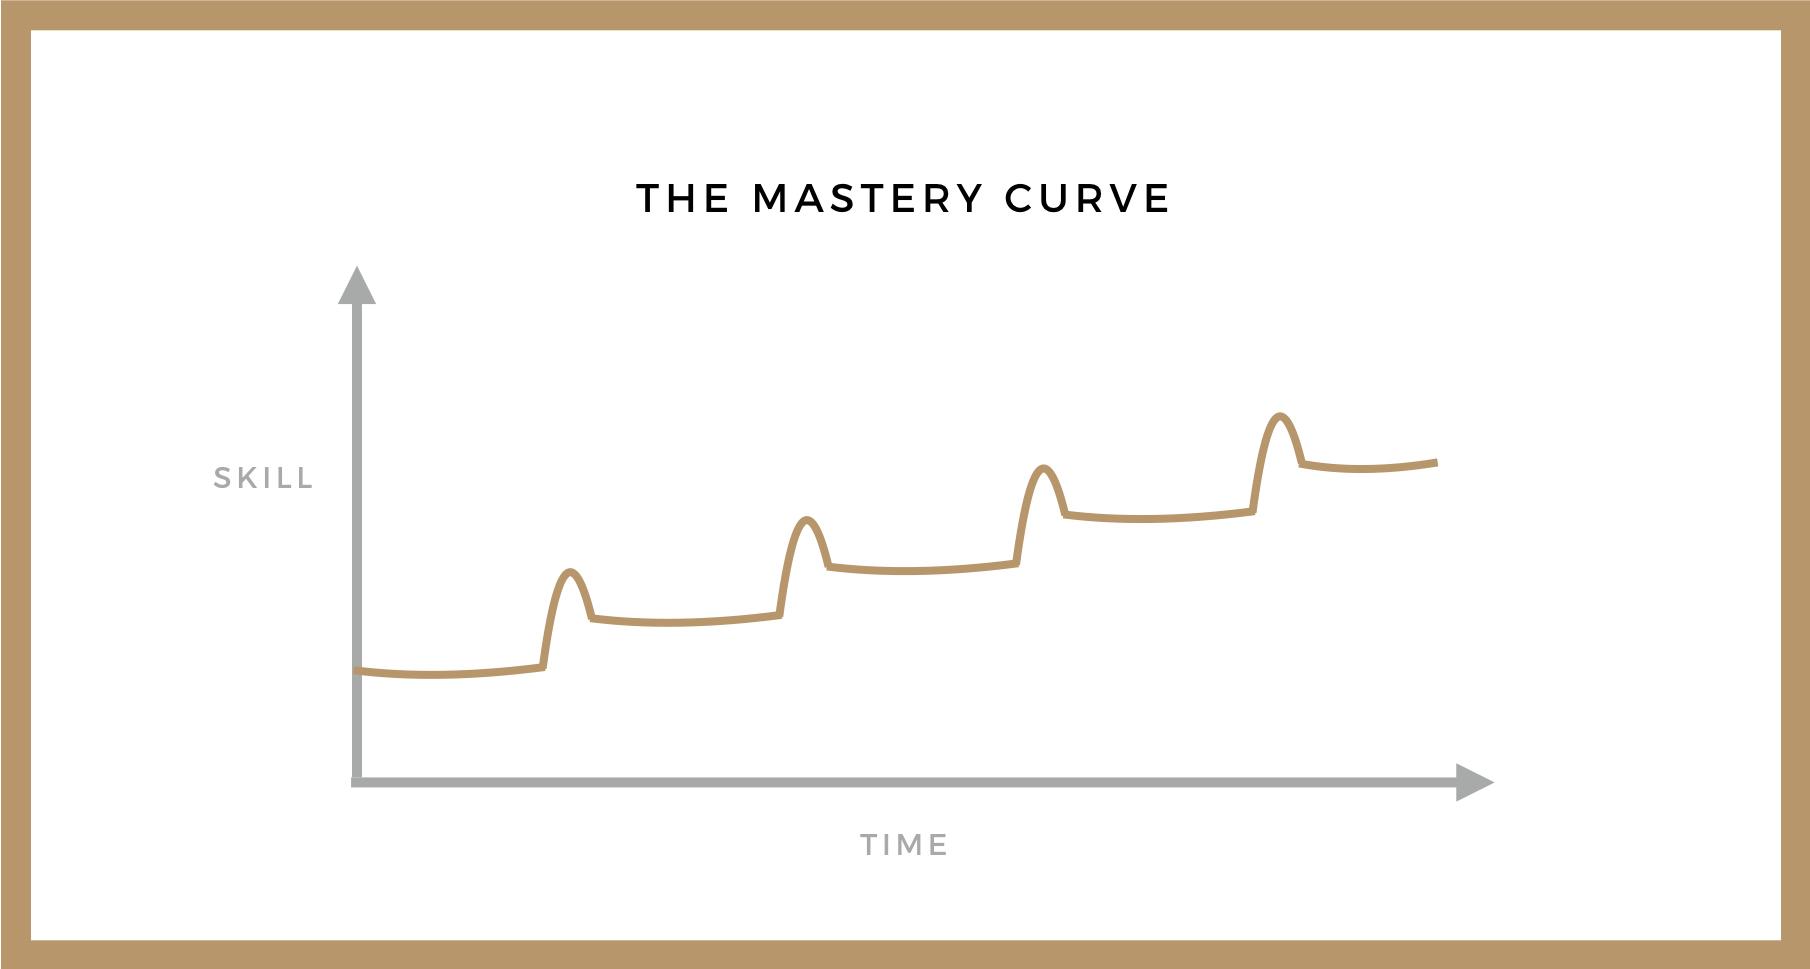 Mastery Curve